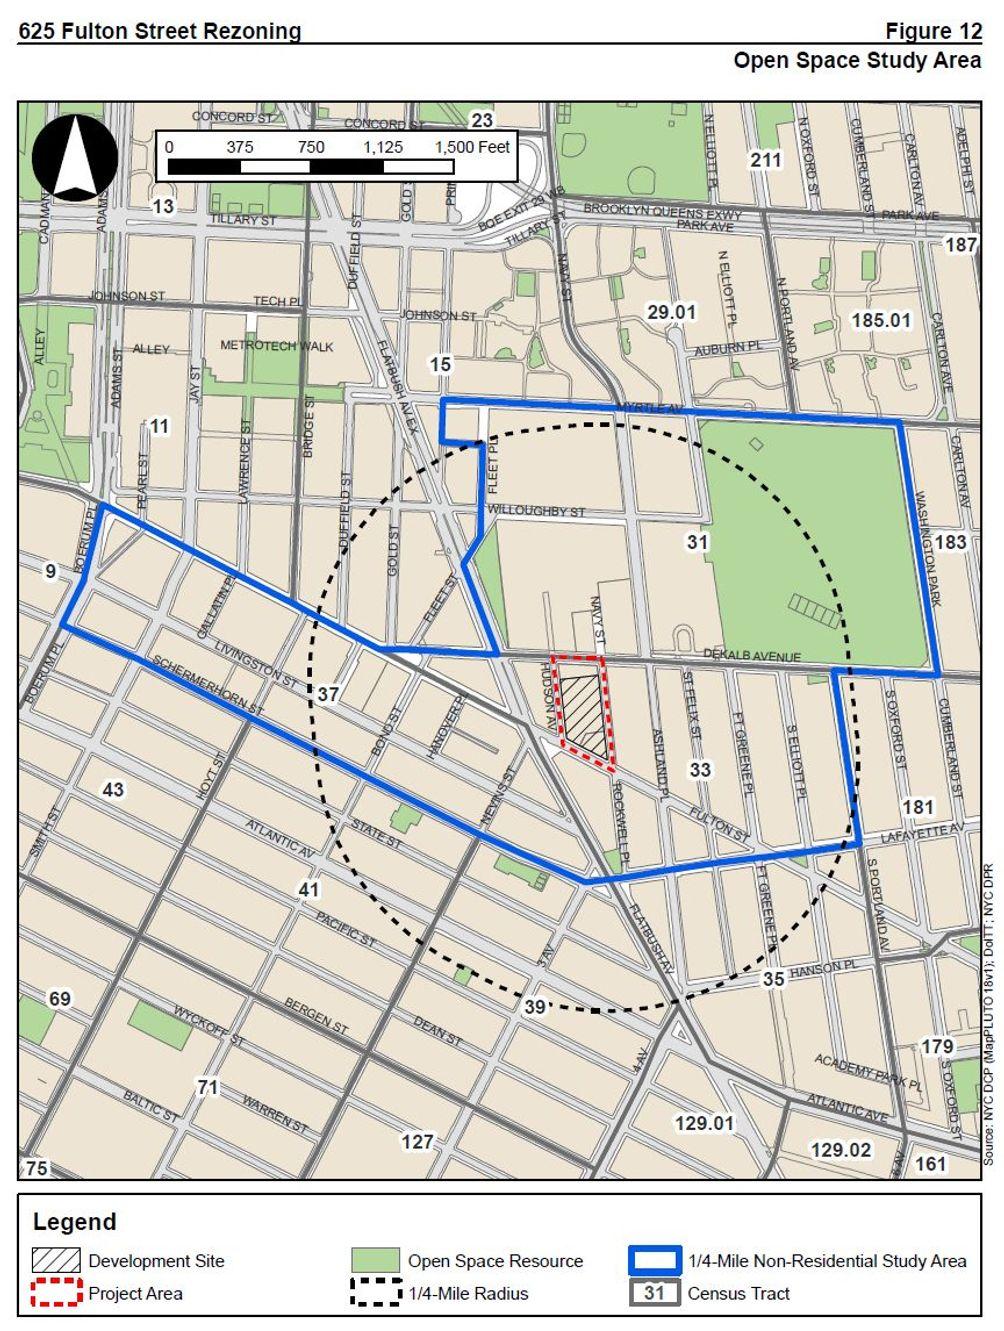 625 Fulton Street, Brooklyn